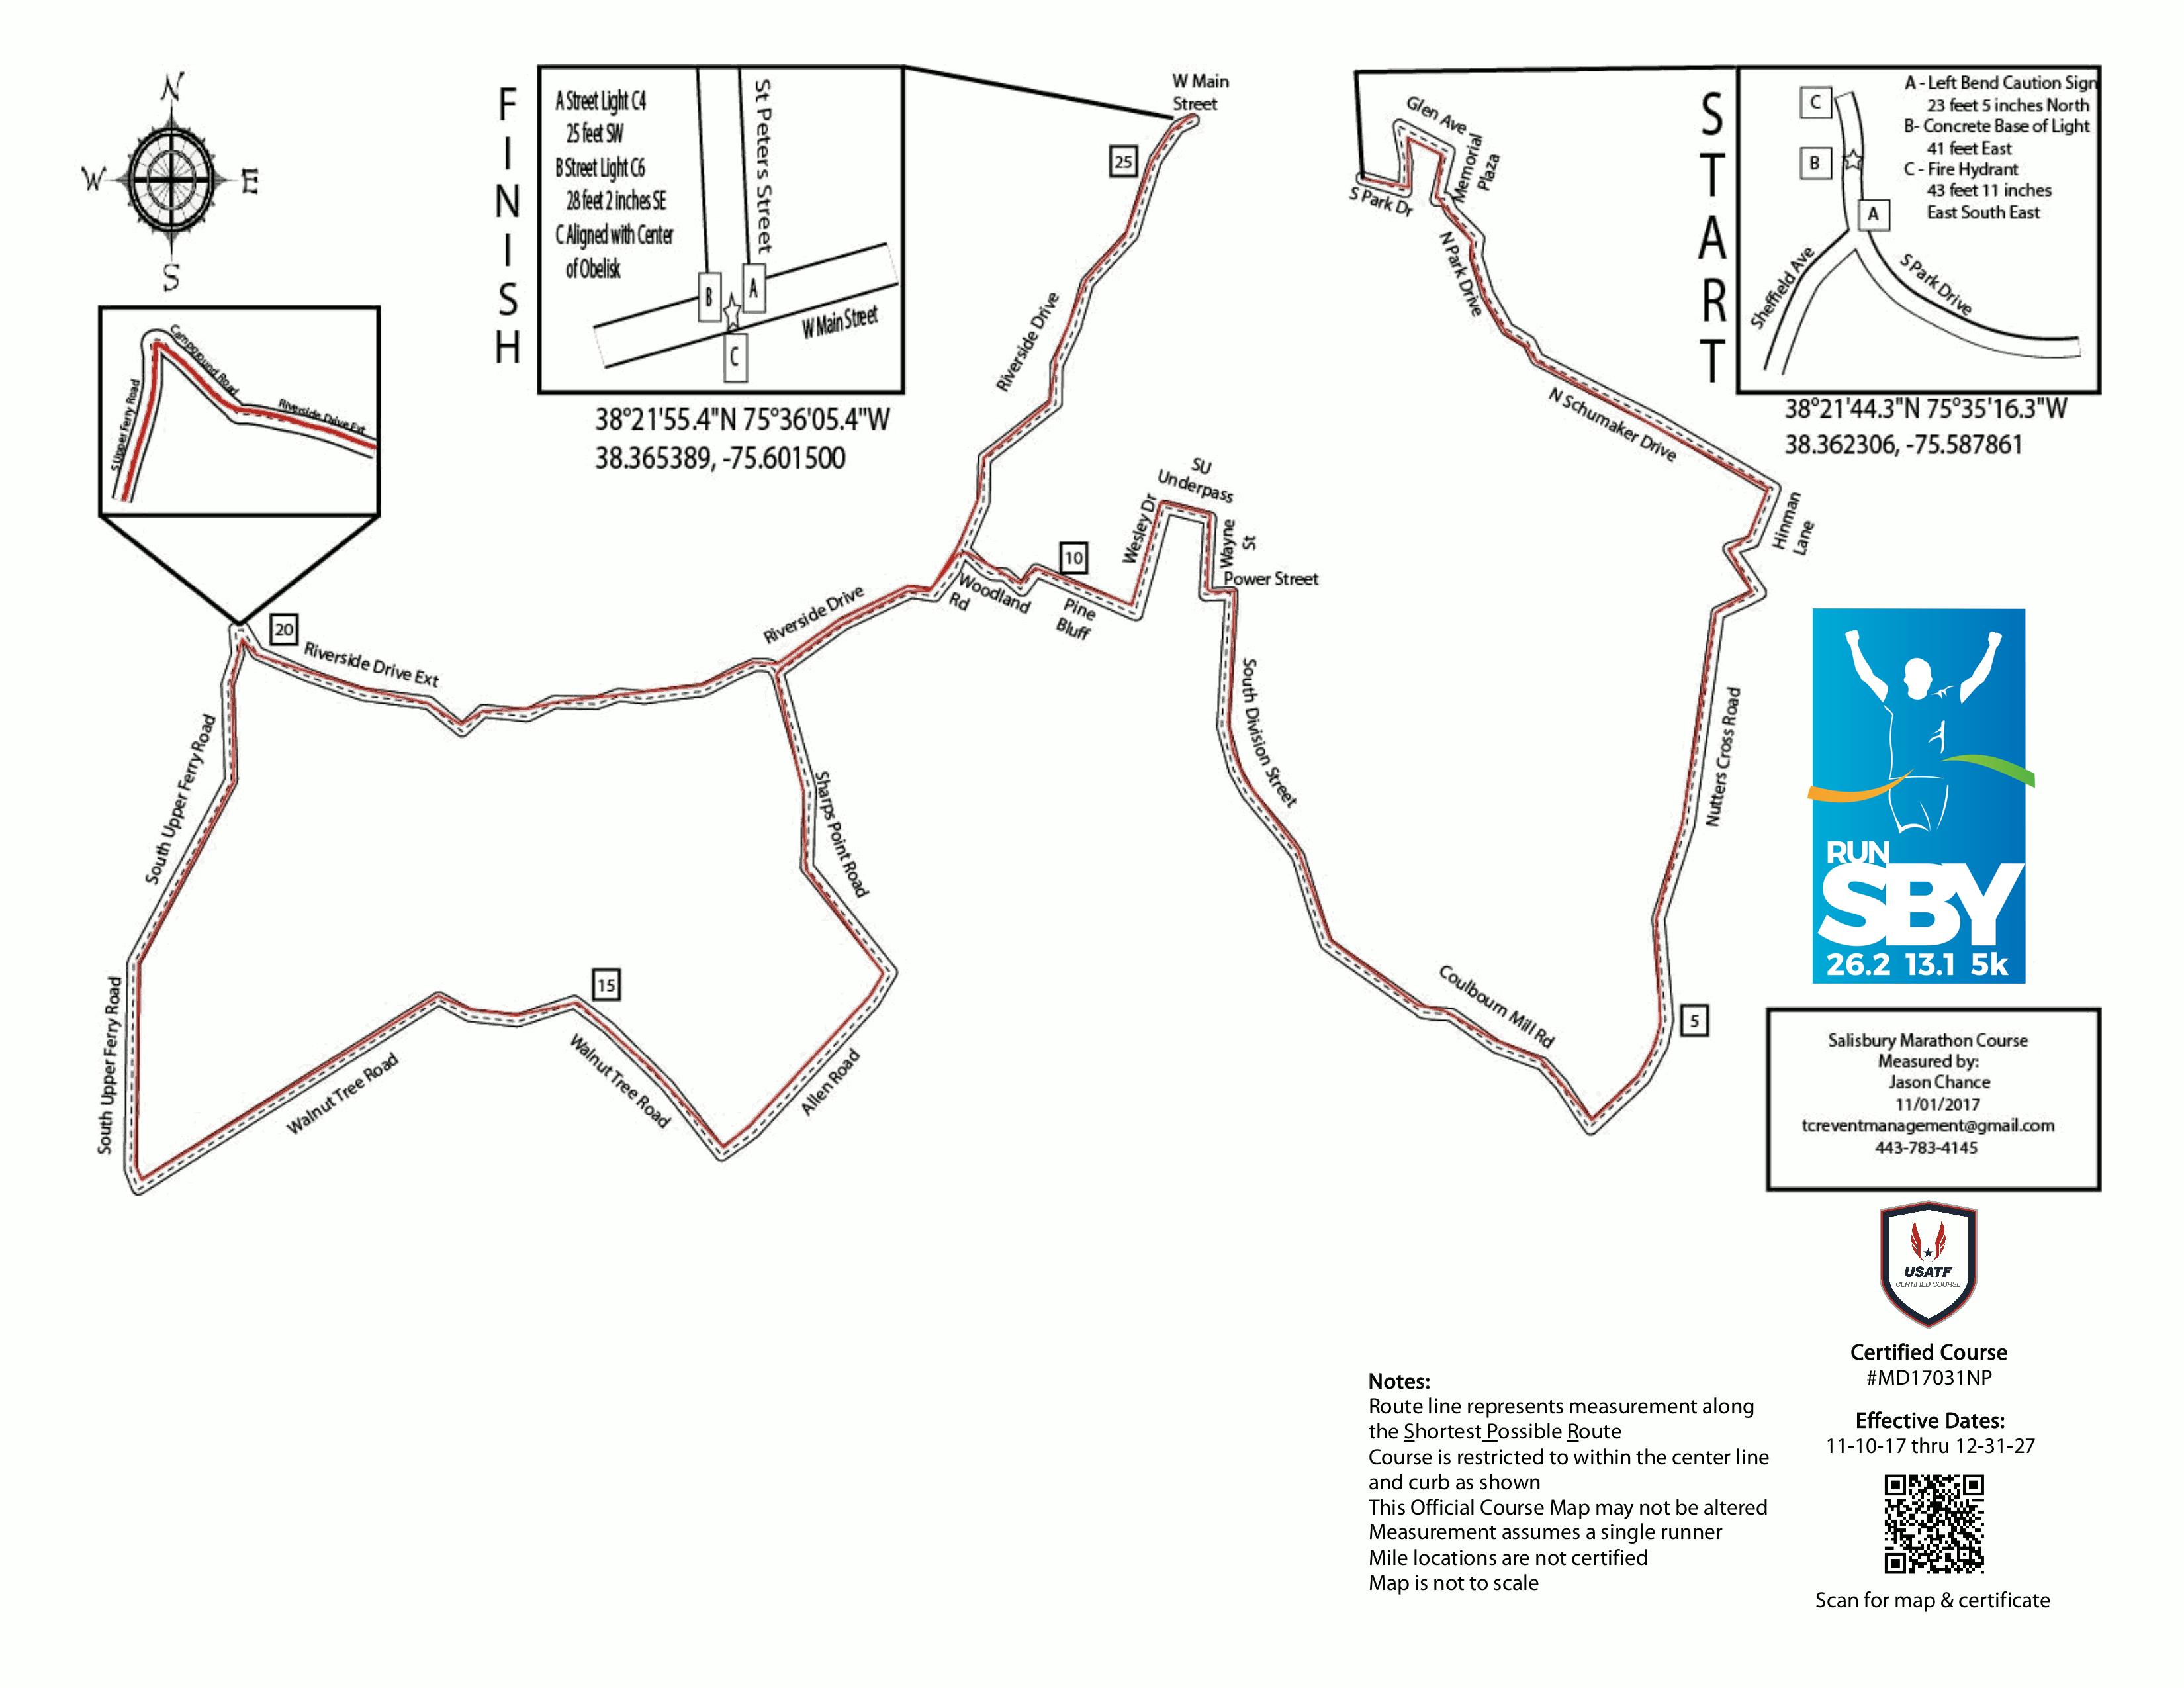 Sby Marathon And Half Marathon Courses Become Boston New York